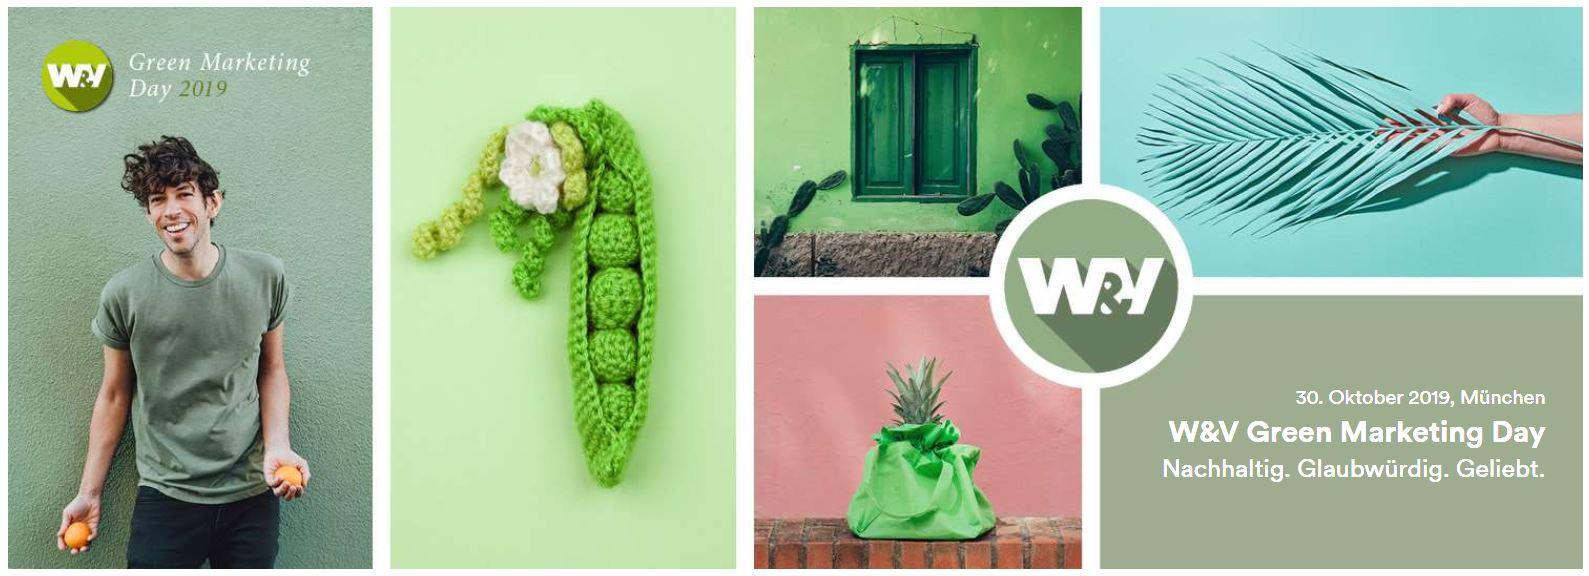 W&V Green Marketing Day 2019